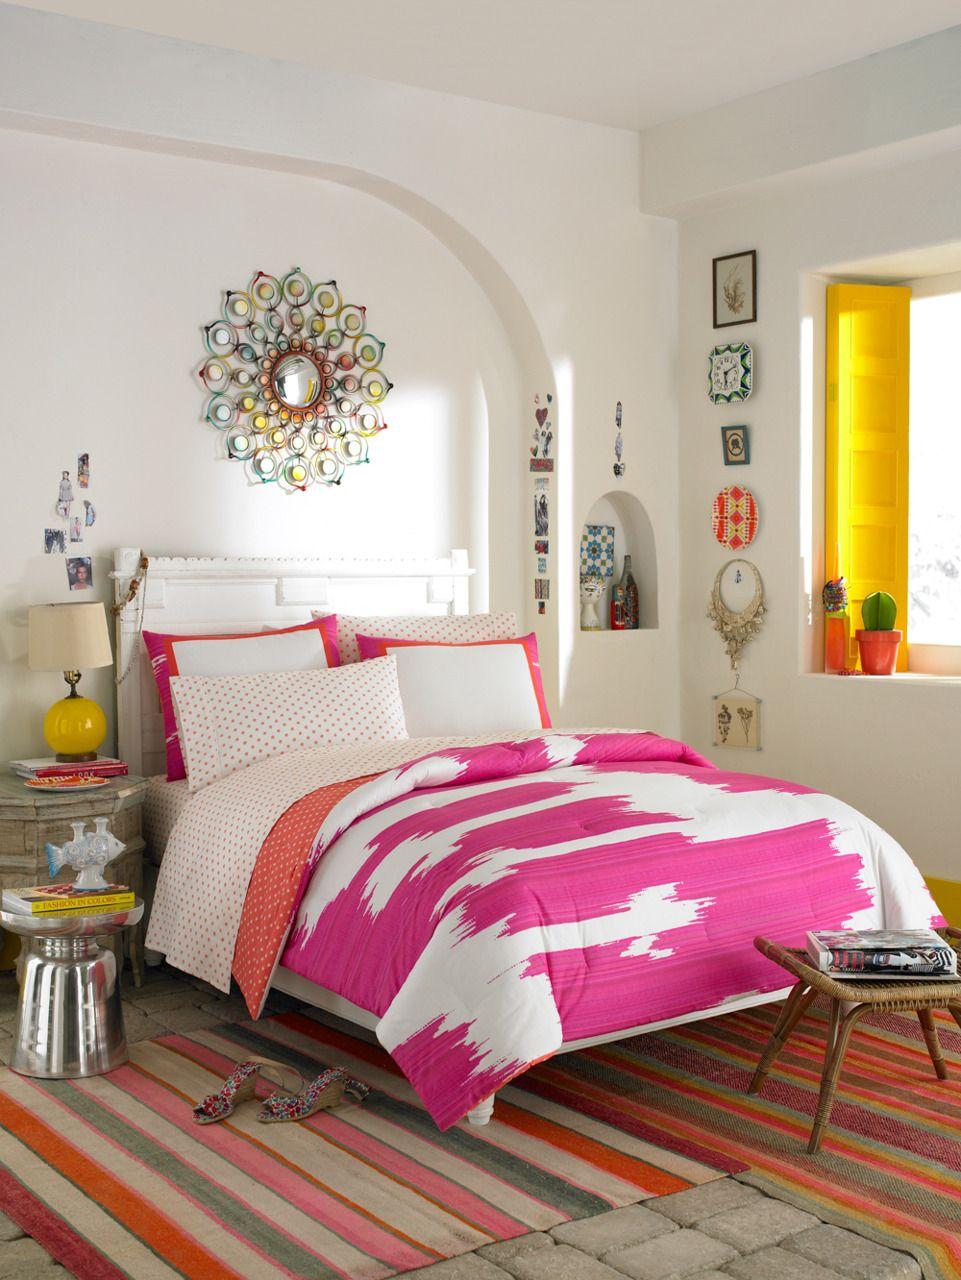 Inspirational Room themes for Teenage Girls